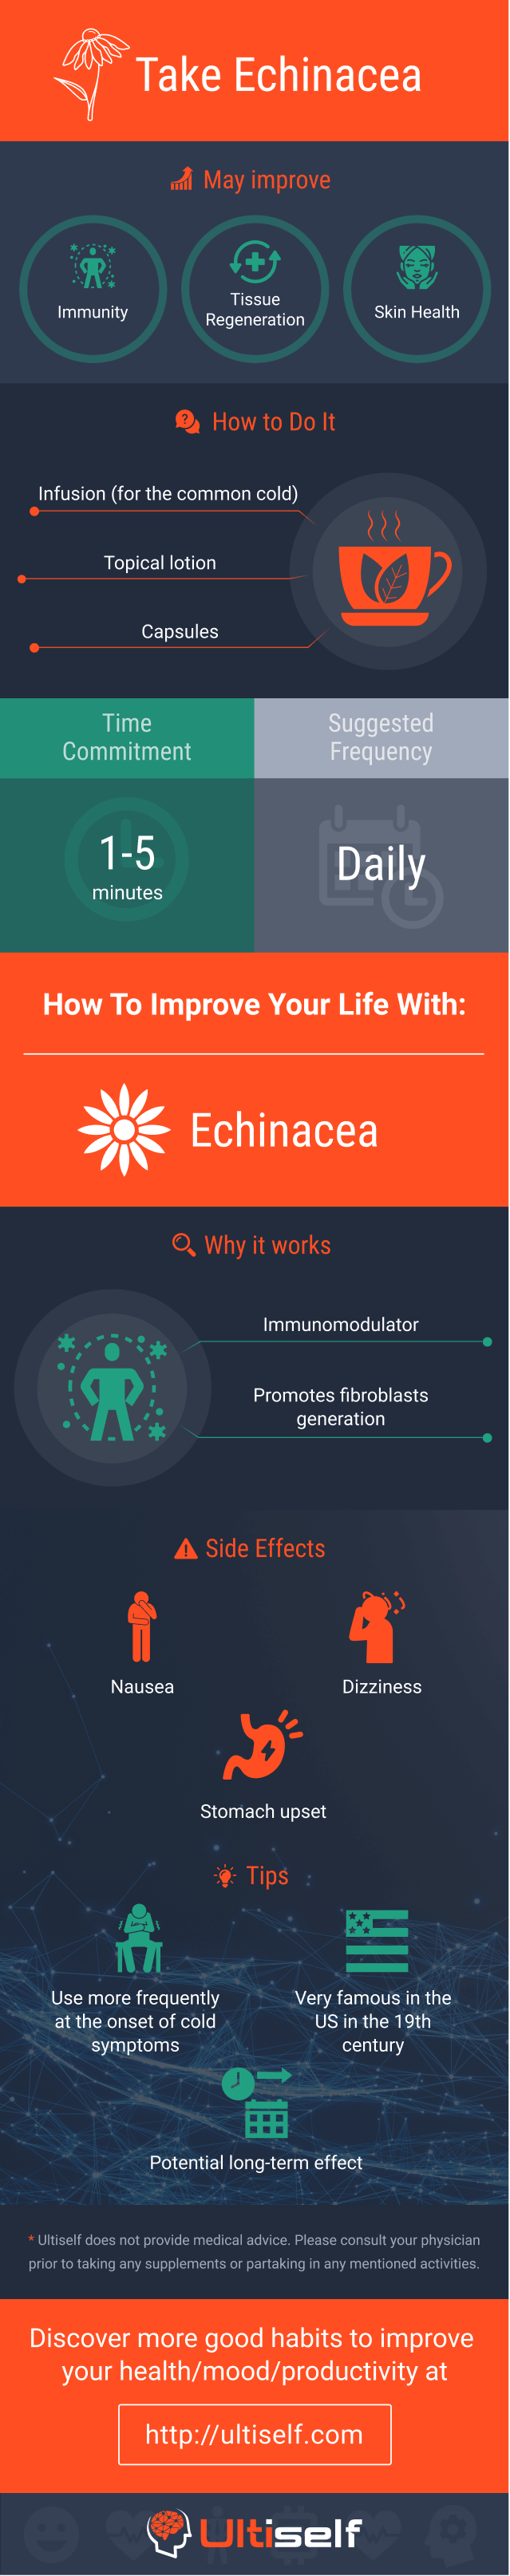 Take Echinacea infographic